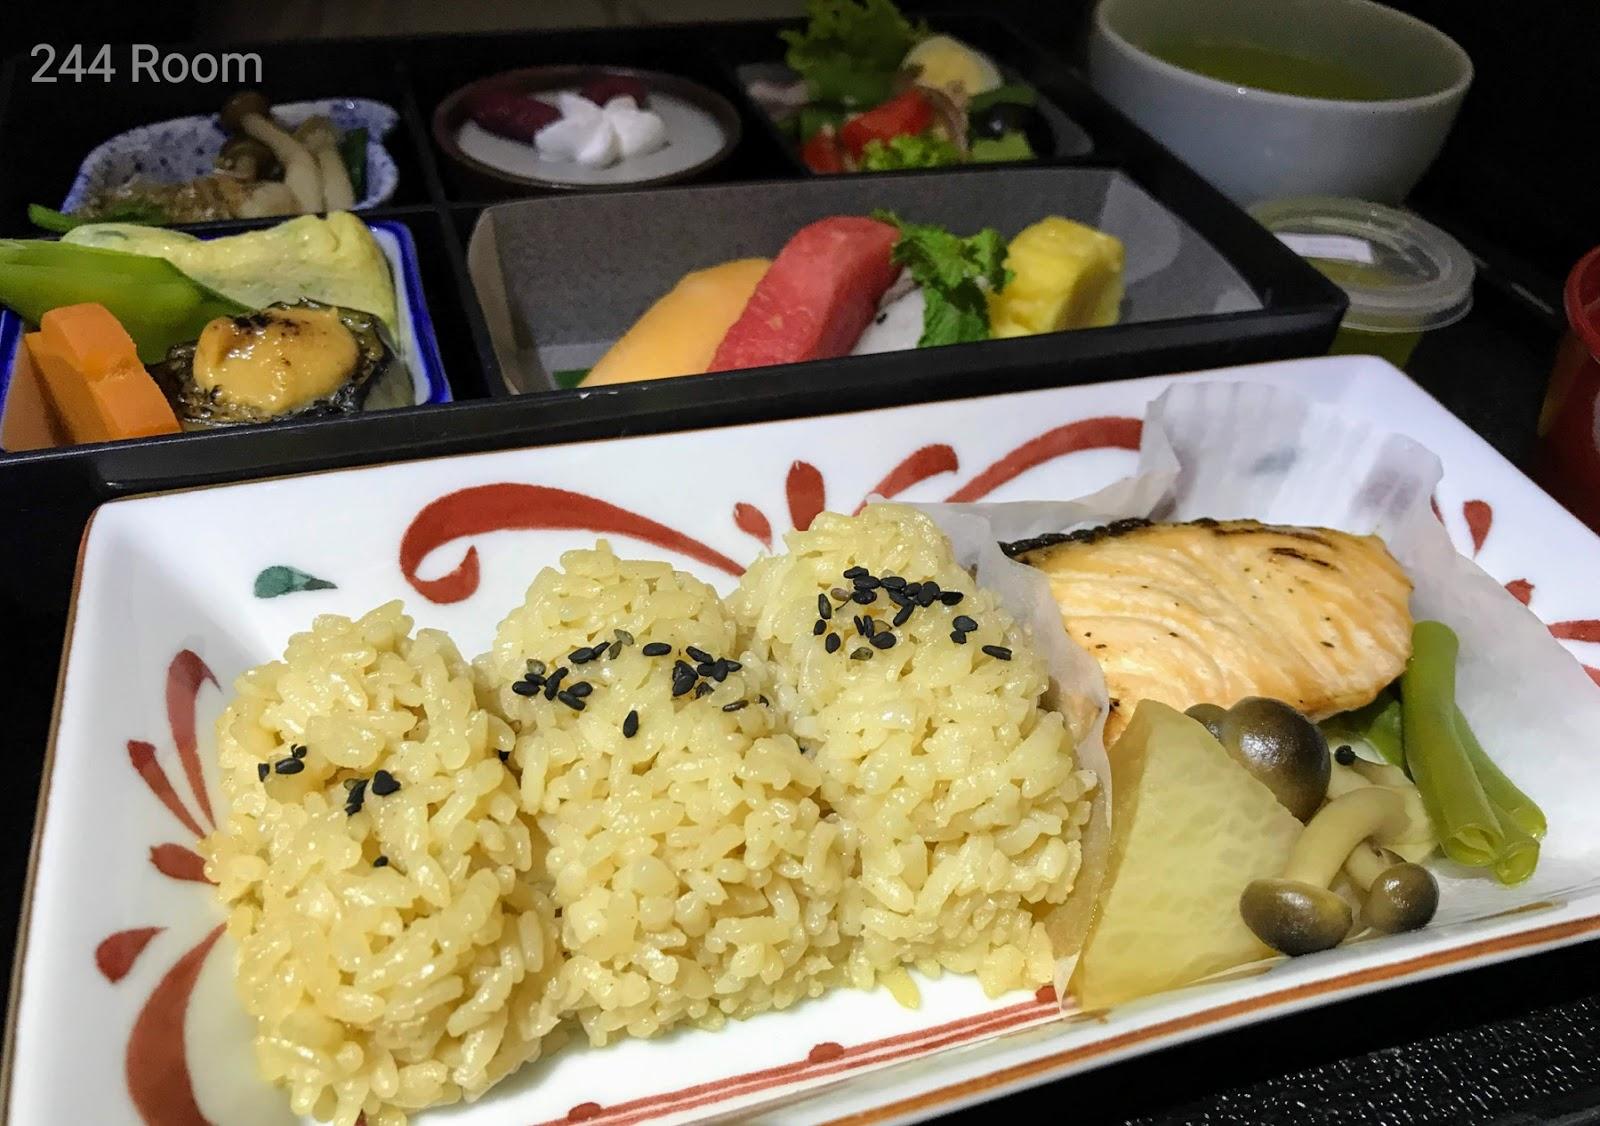 JALビジネスクラスシート機内食3 Business class flight meal